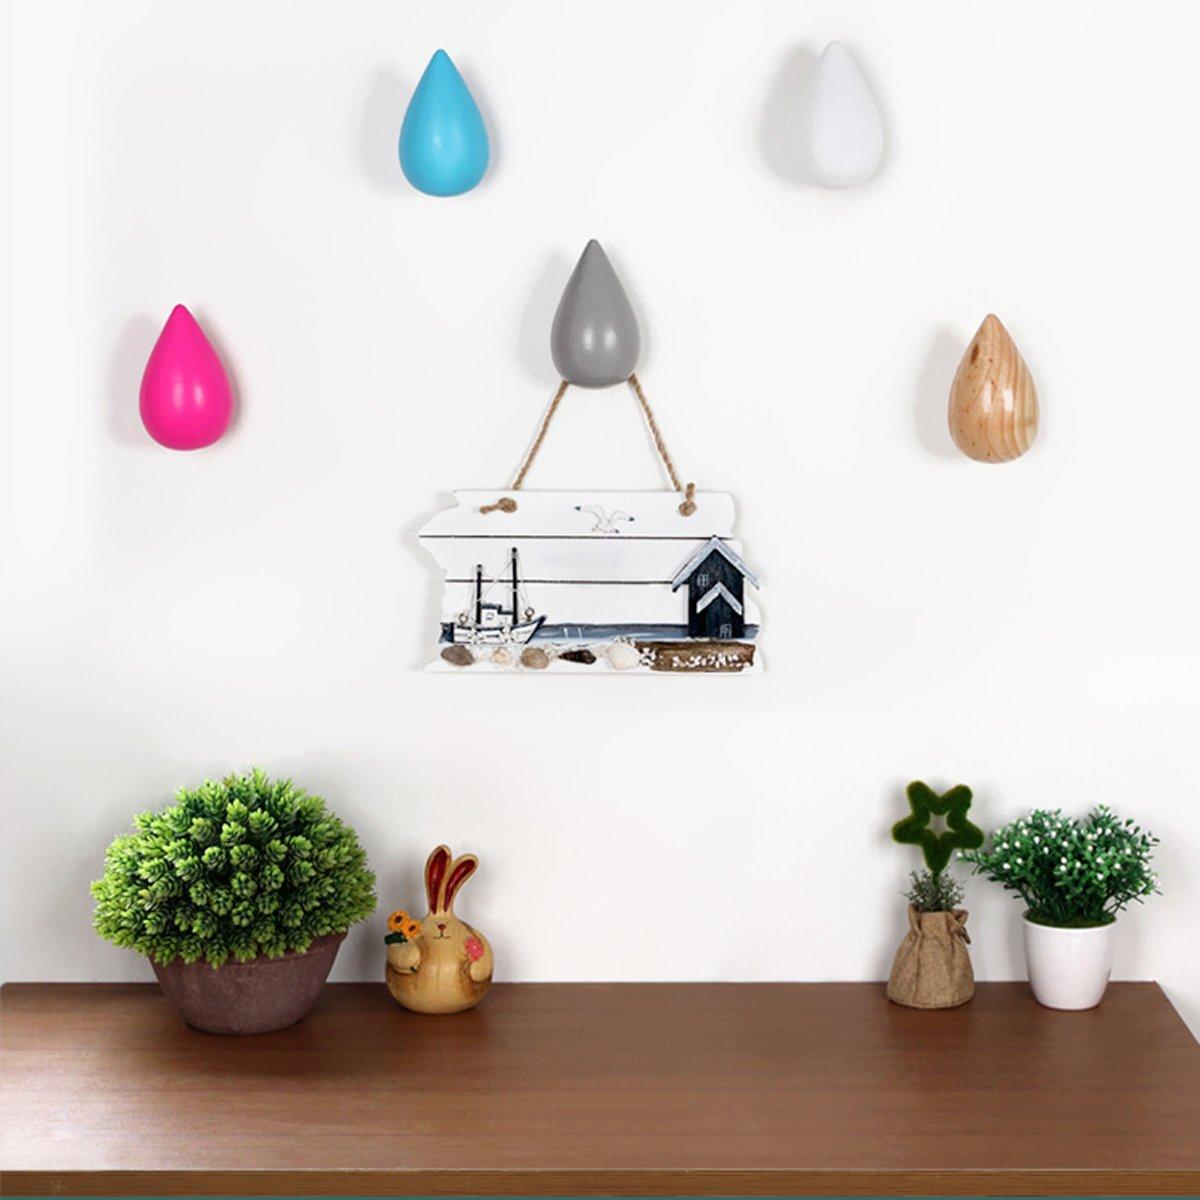 Percheros de pared BESTOMZ Gancho de pared madera para colgar ropa abrigos en forma de gotas de agua